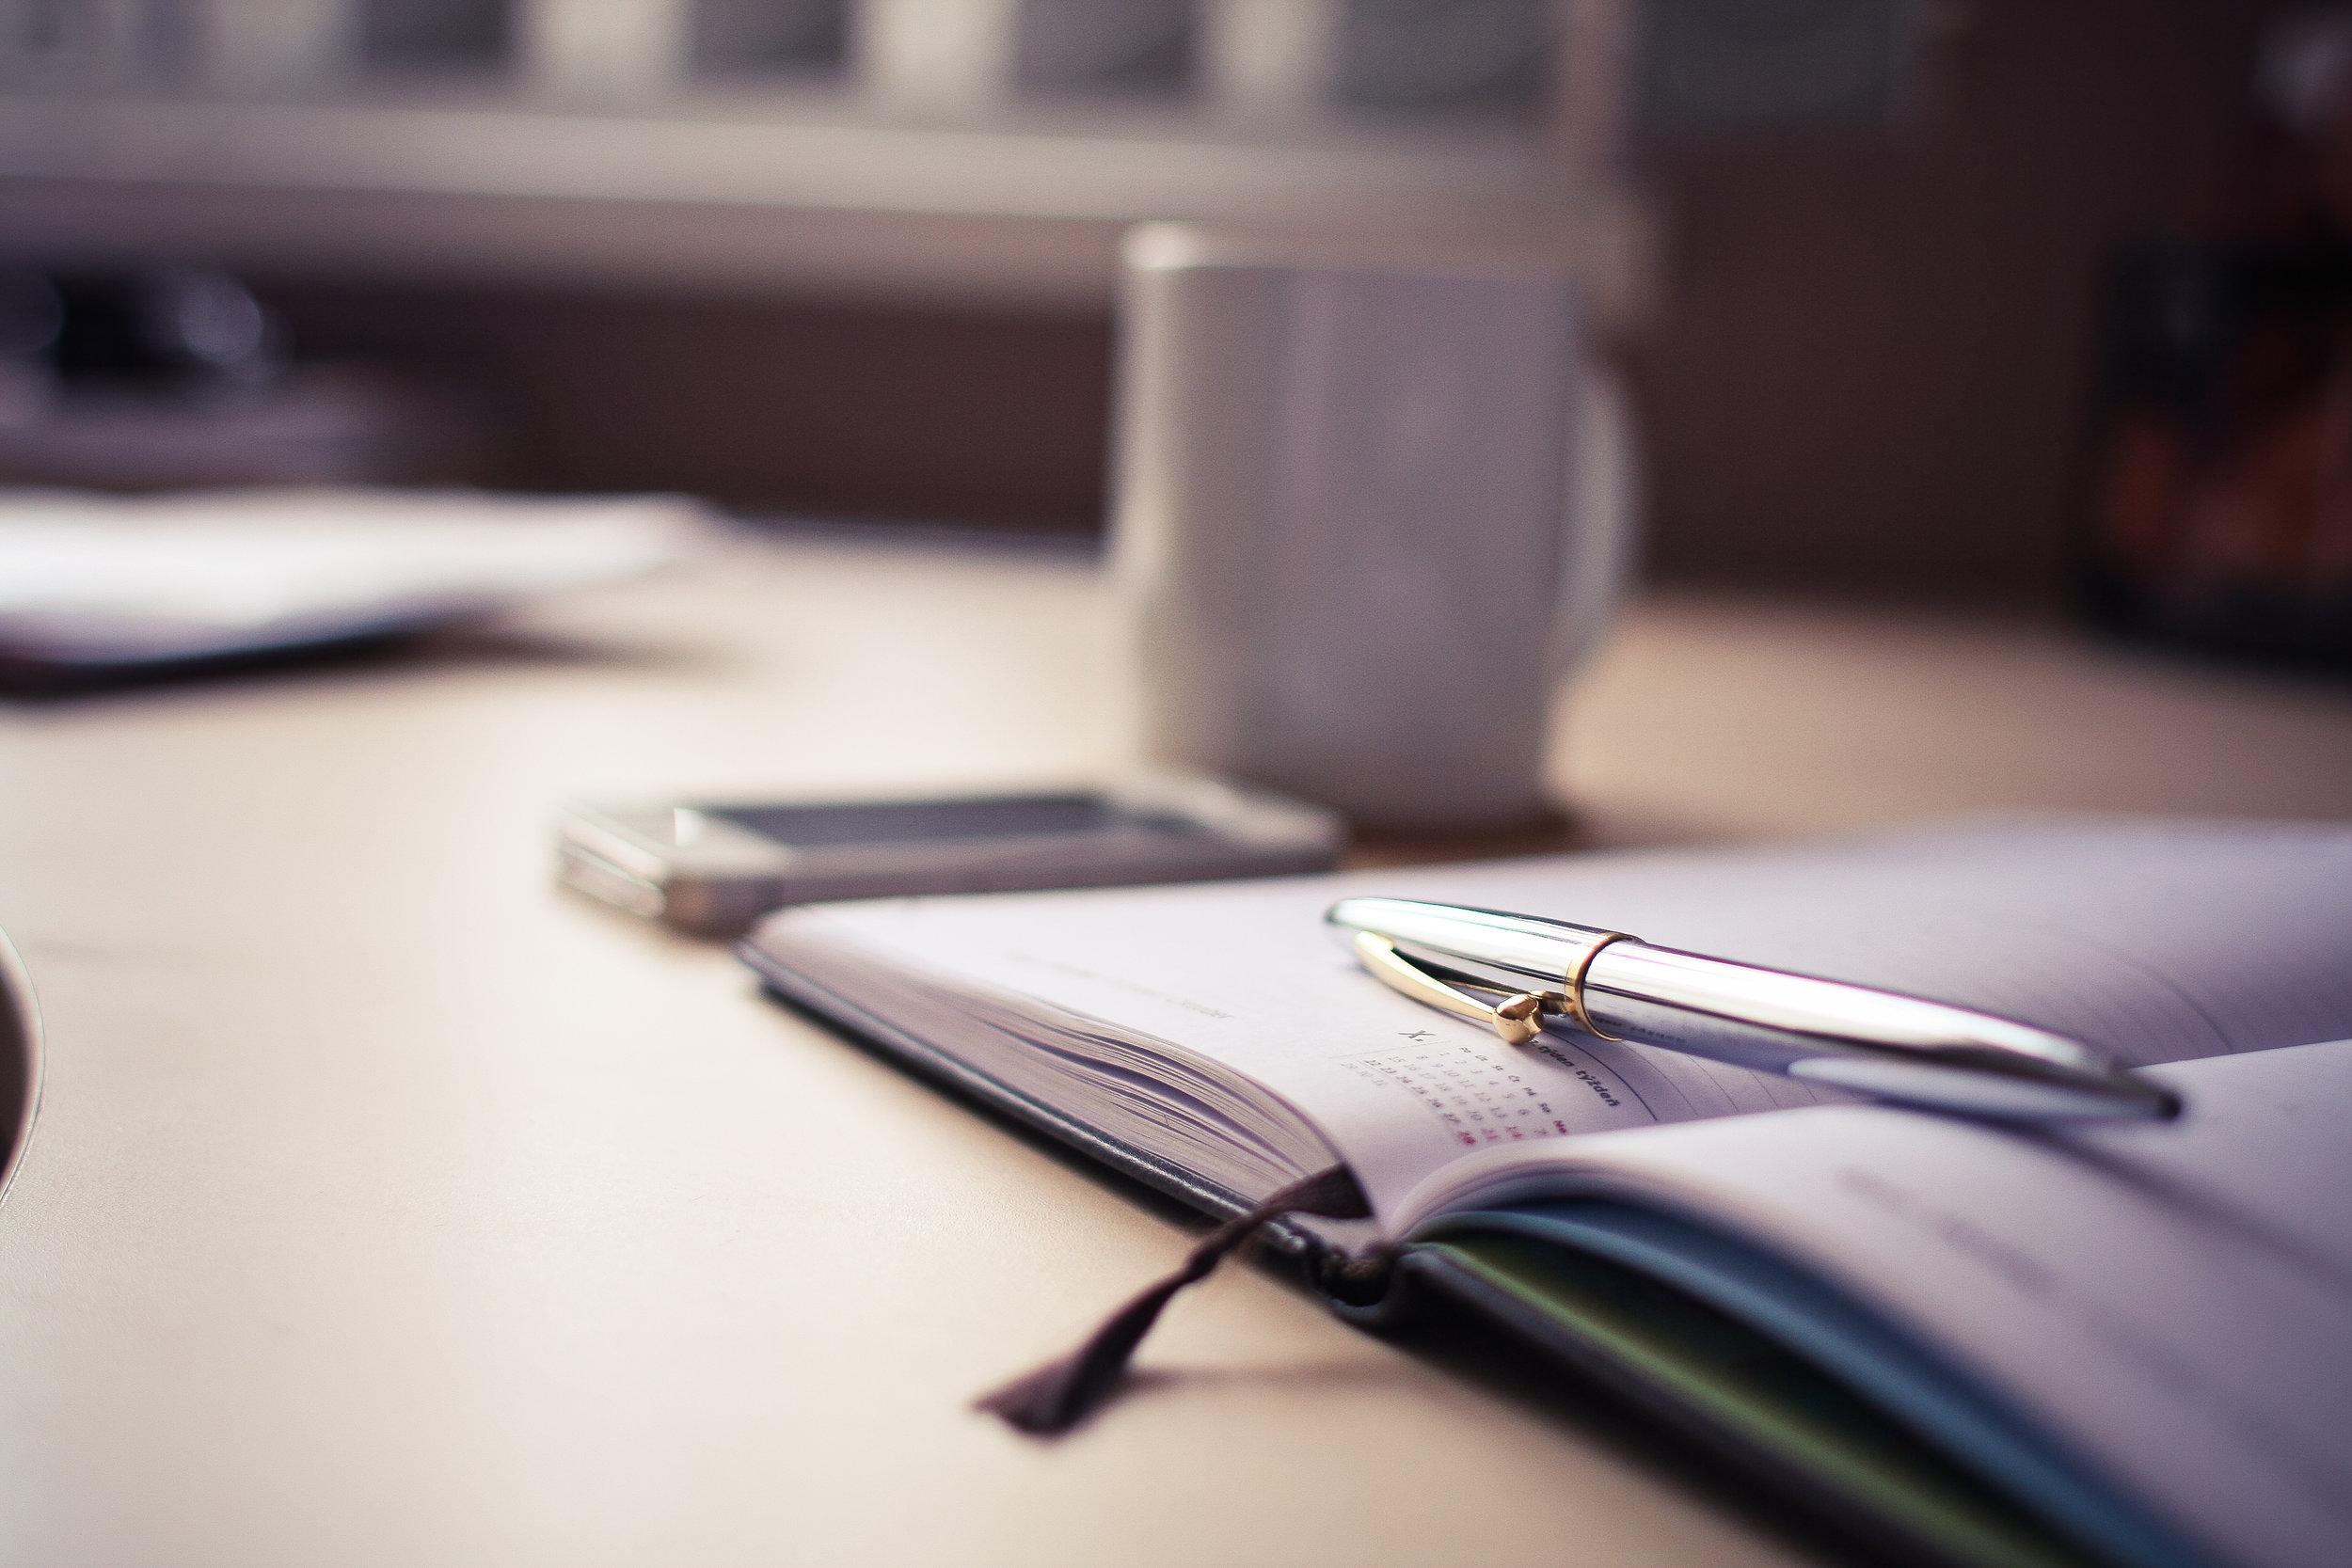 luxury-silver-pen-with-a-business-diary-picjumbo-com.jpg